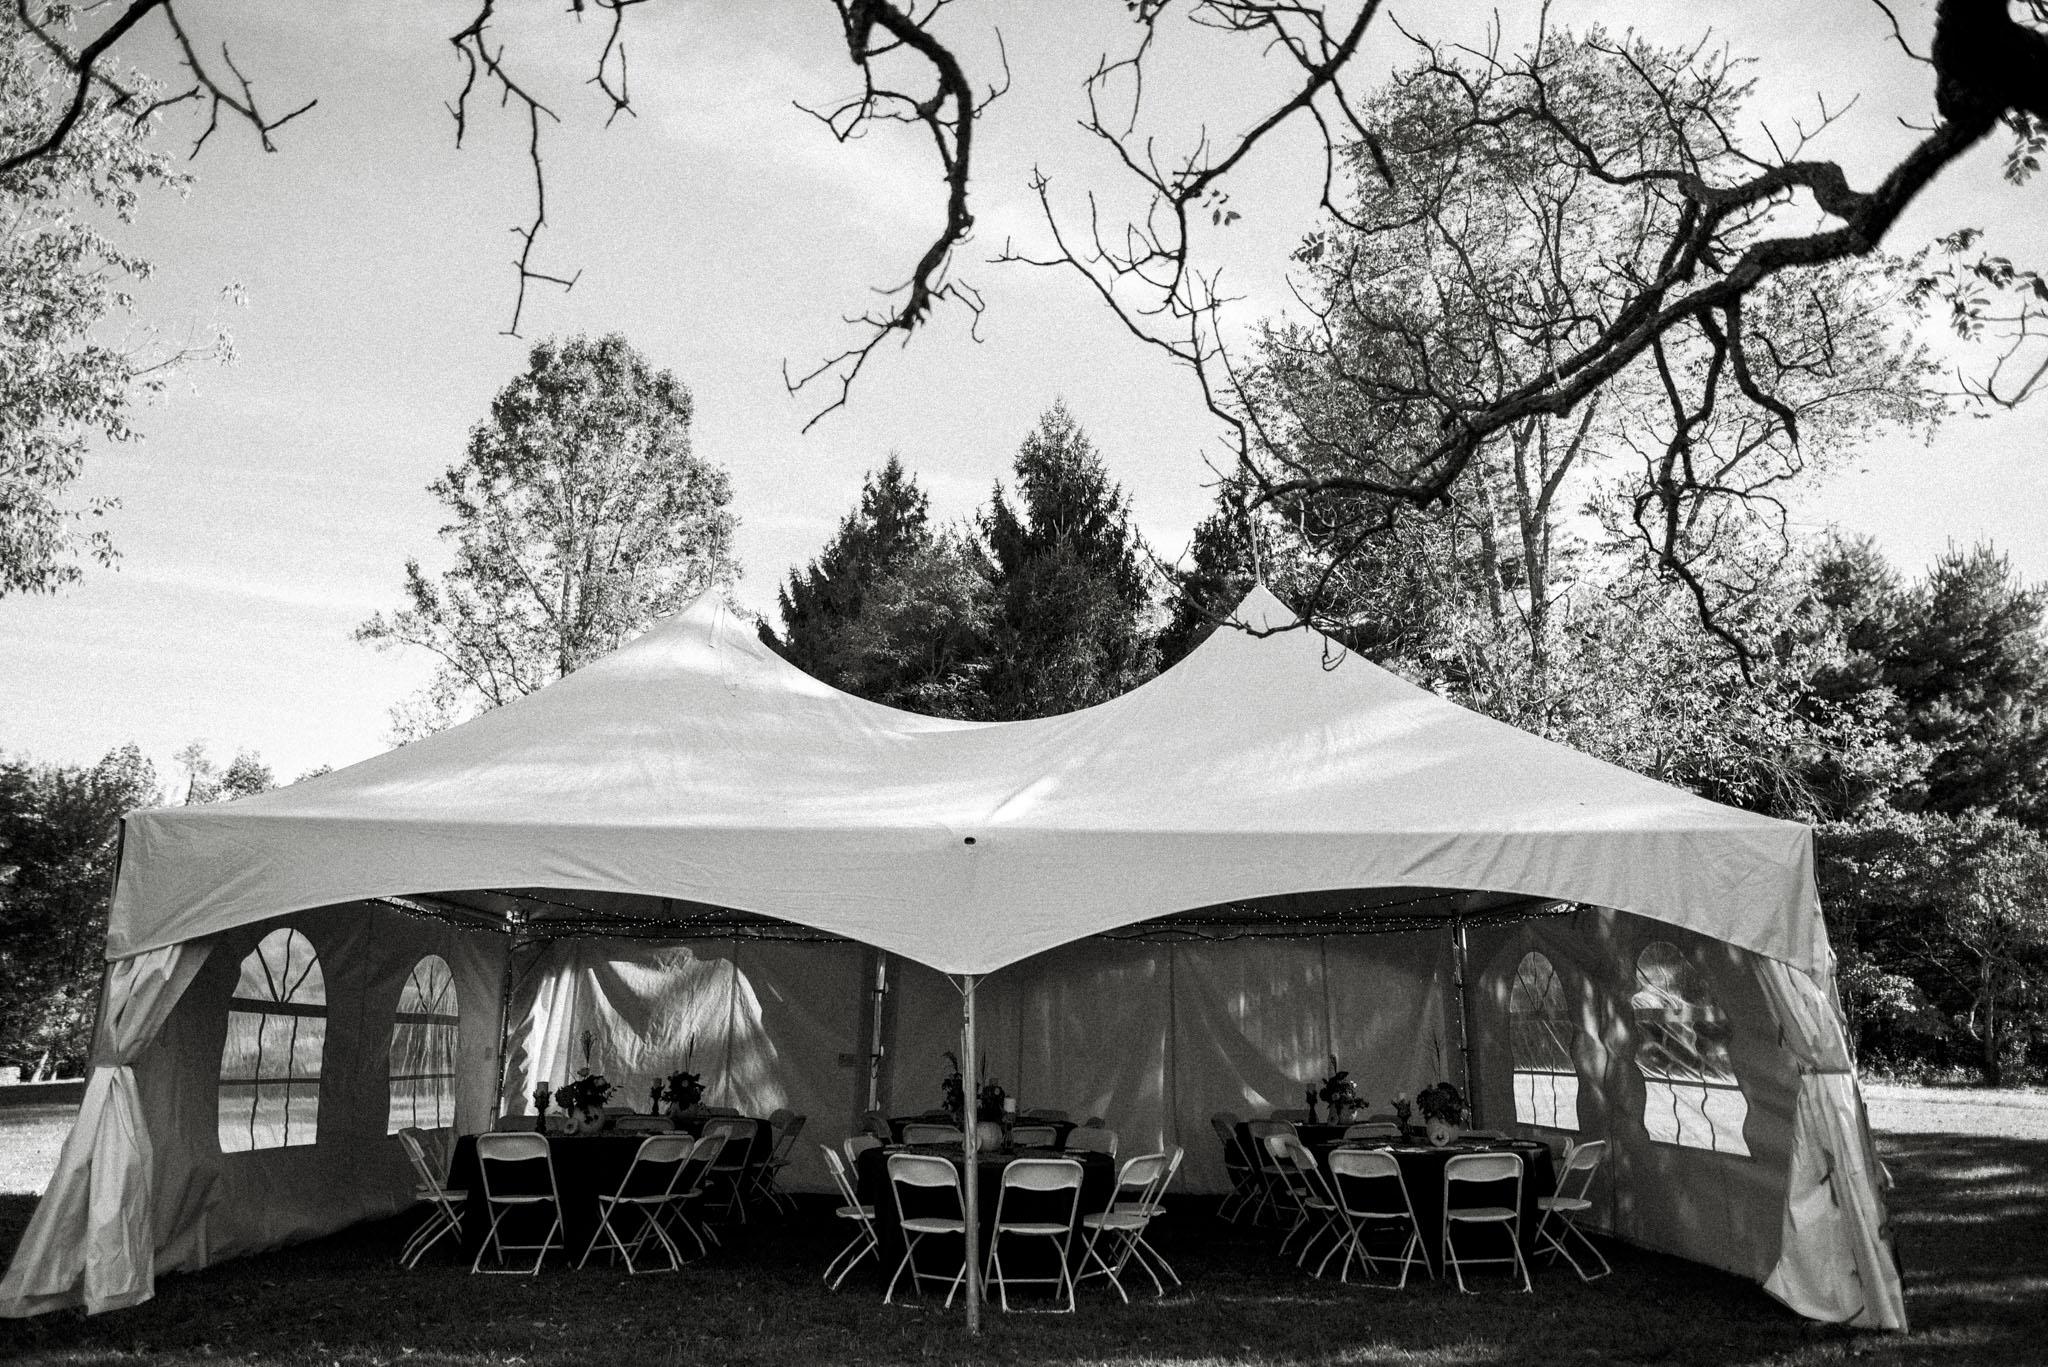 Hannah and Shannon - Autumn Back yard wedding - Loudoun County Little Washington Wedding - Intimate Wedding - White Sails Creative Photography_25.jpg